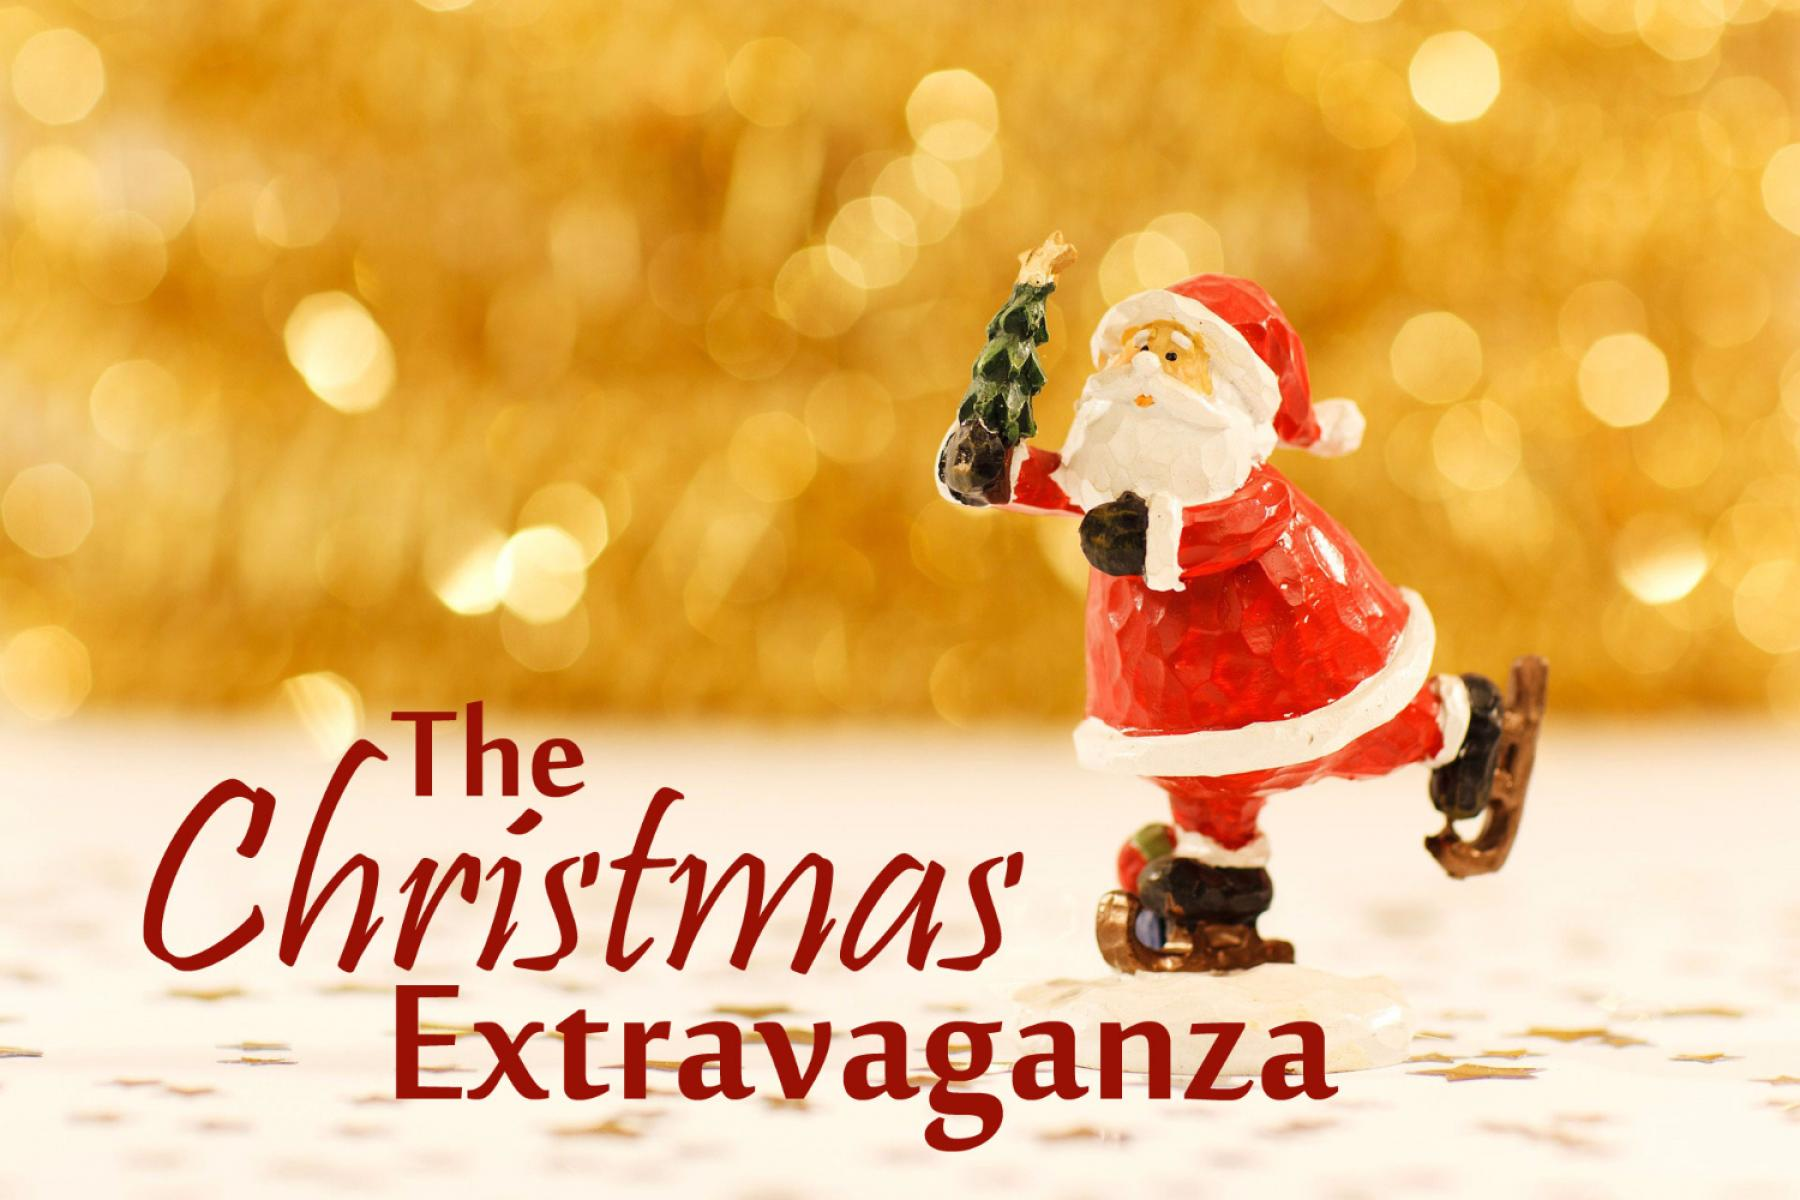 Issa Christmas Extravaganza